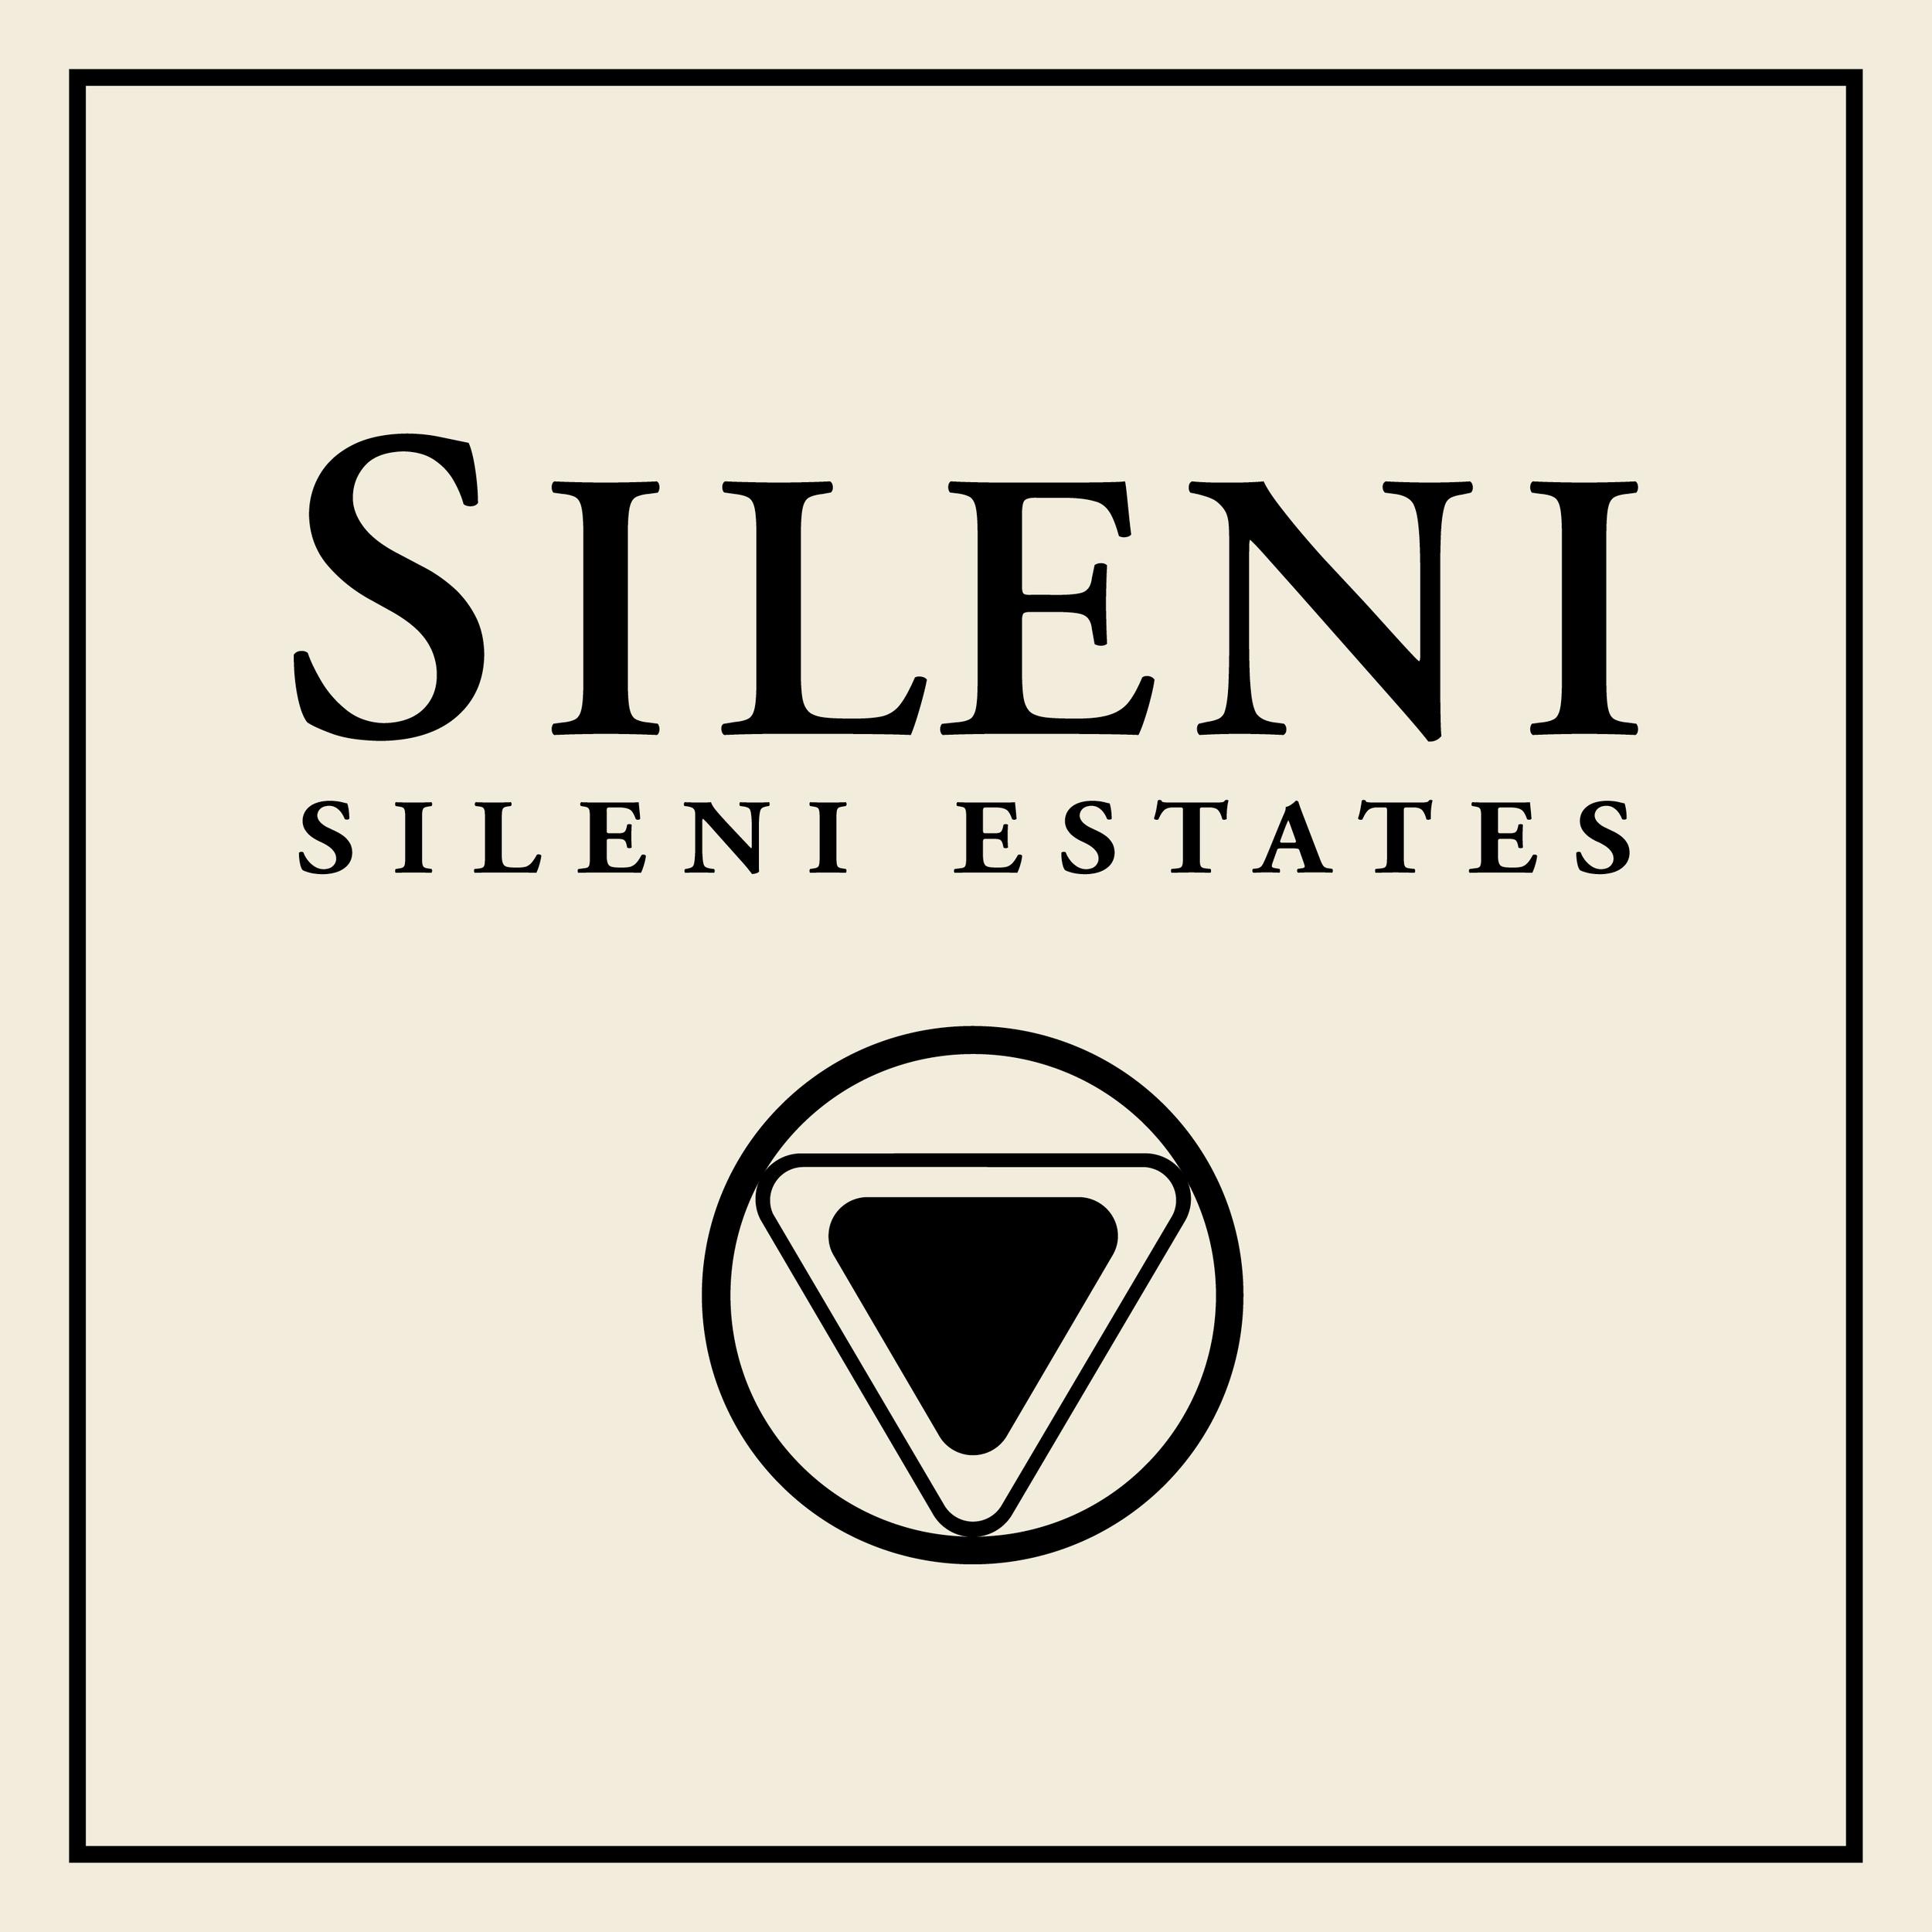 Sileni square logo 2.jpg